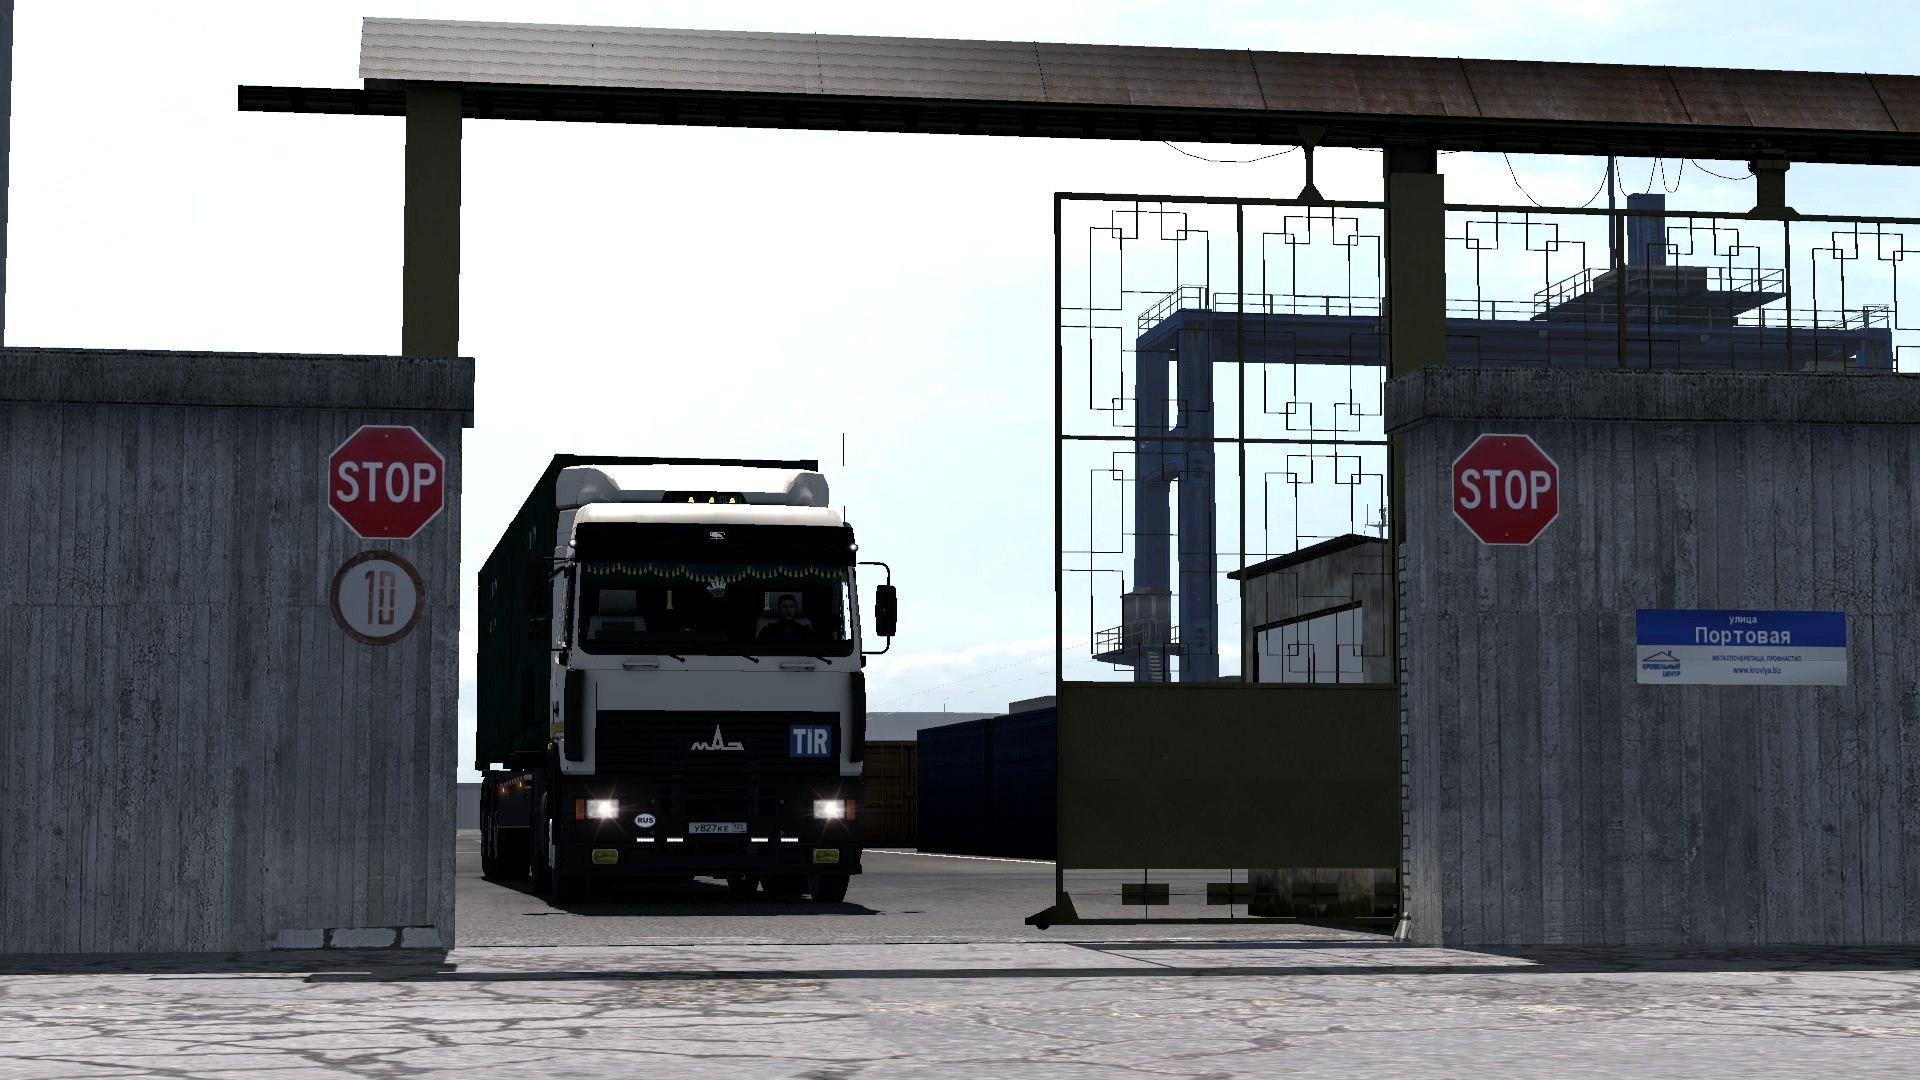 49Y_EDcOZHg.jpg - Euro Truck Simulator 2